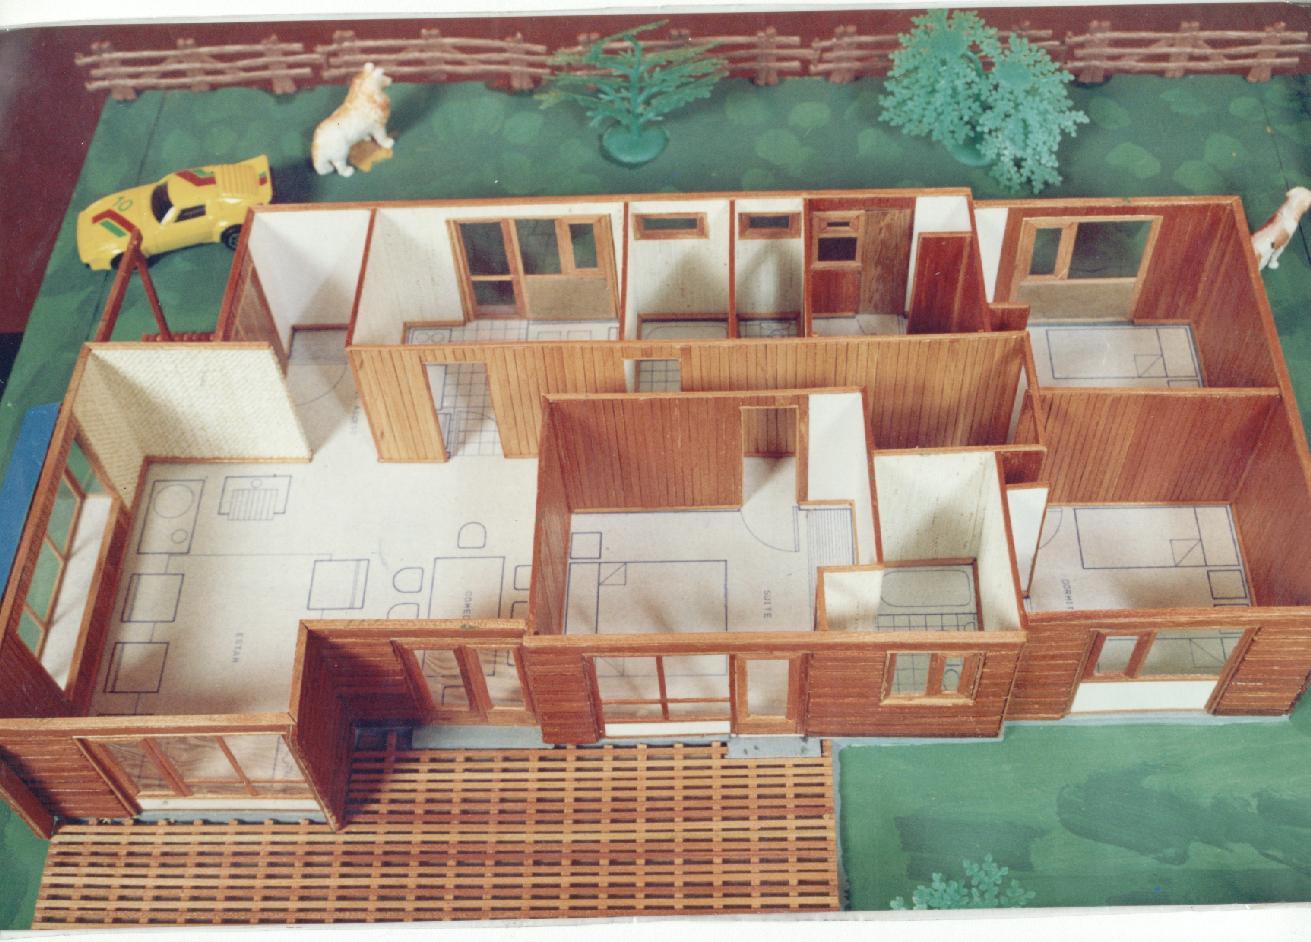 Planos de casas modelos y dise os de casas planos de - Diseno casas rusticas ...